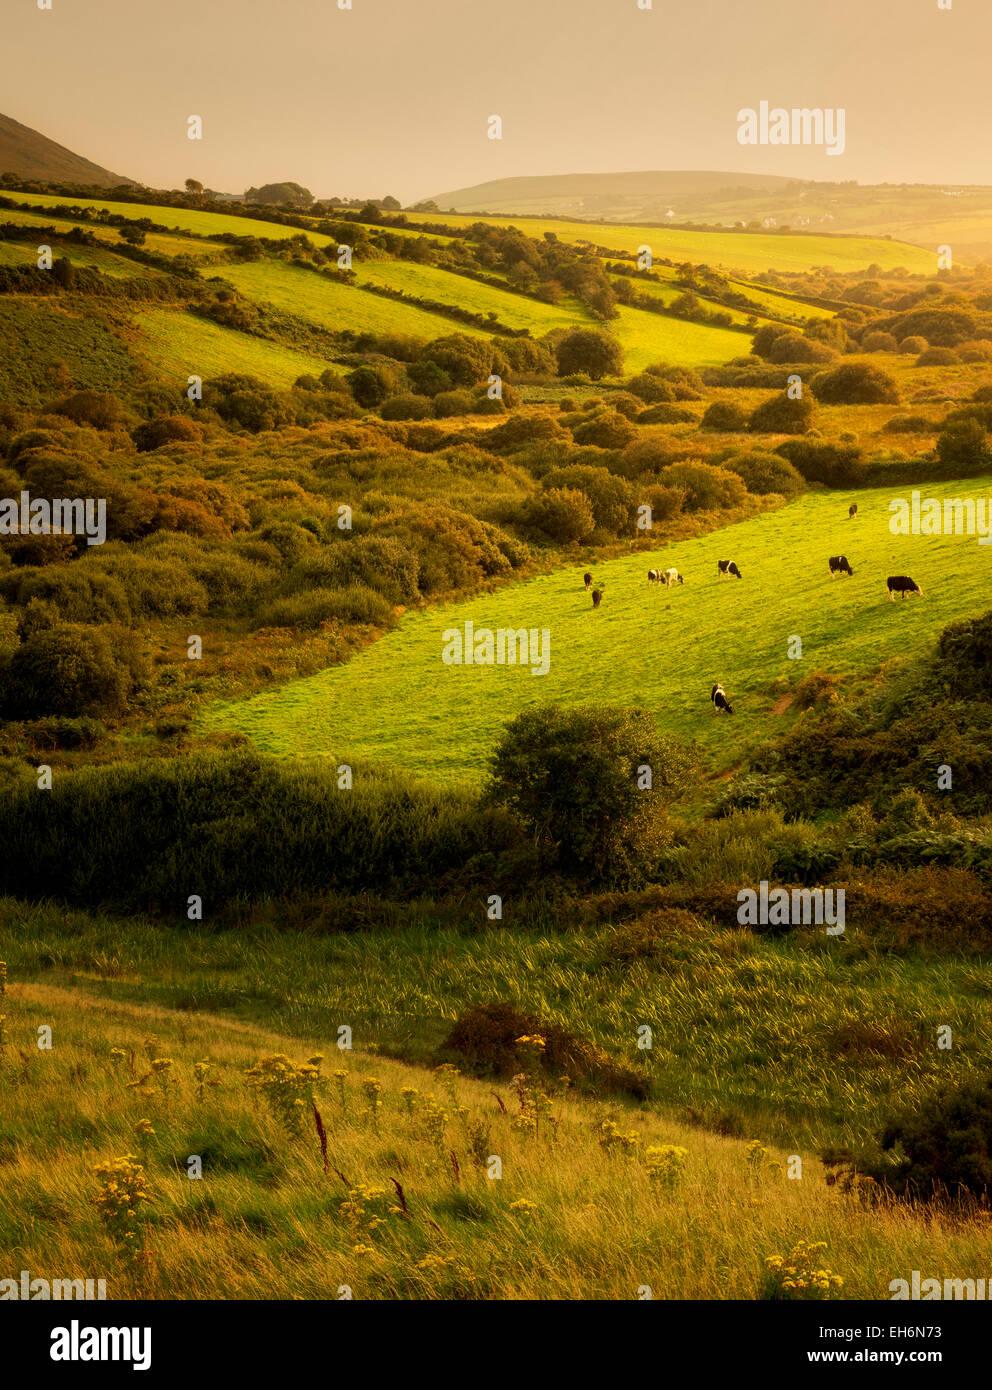 Pastorale Szene mit Kühen und Weide. Dingle-Halbinsel. Irland Stockbild